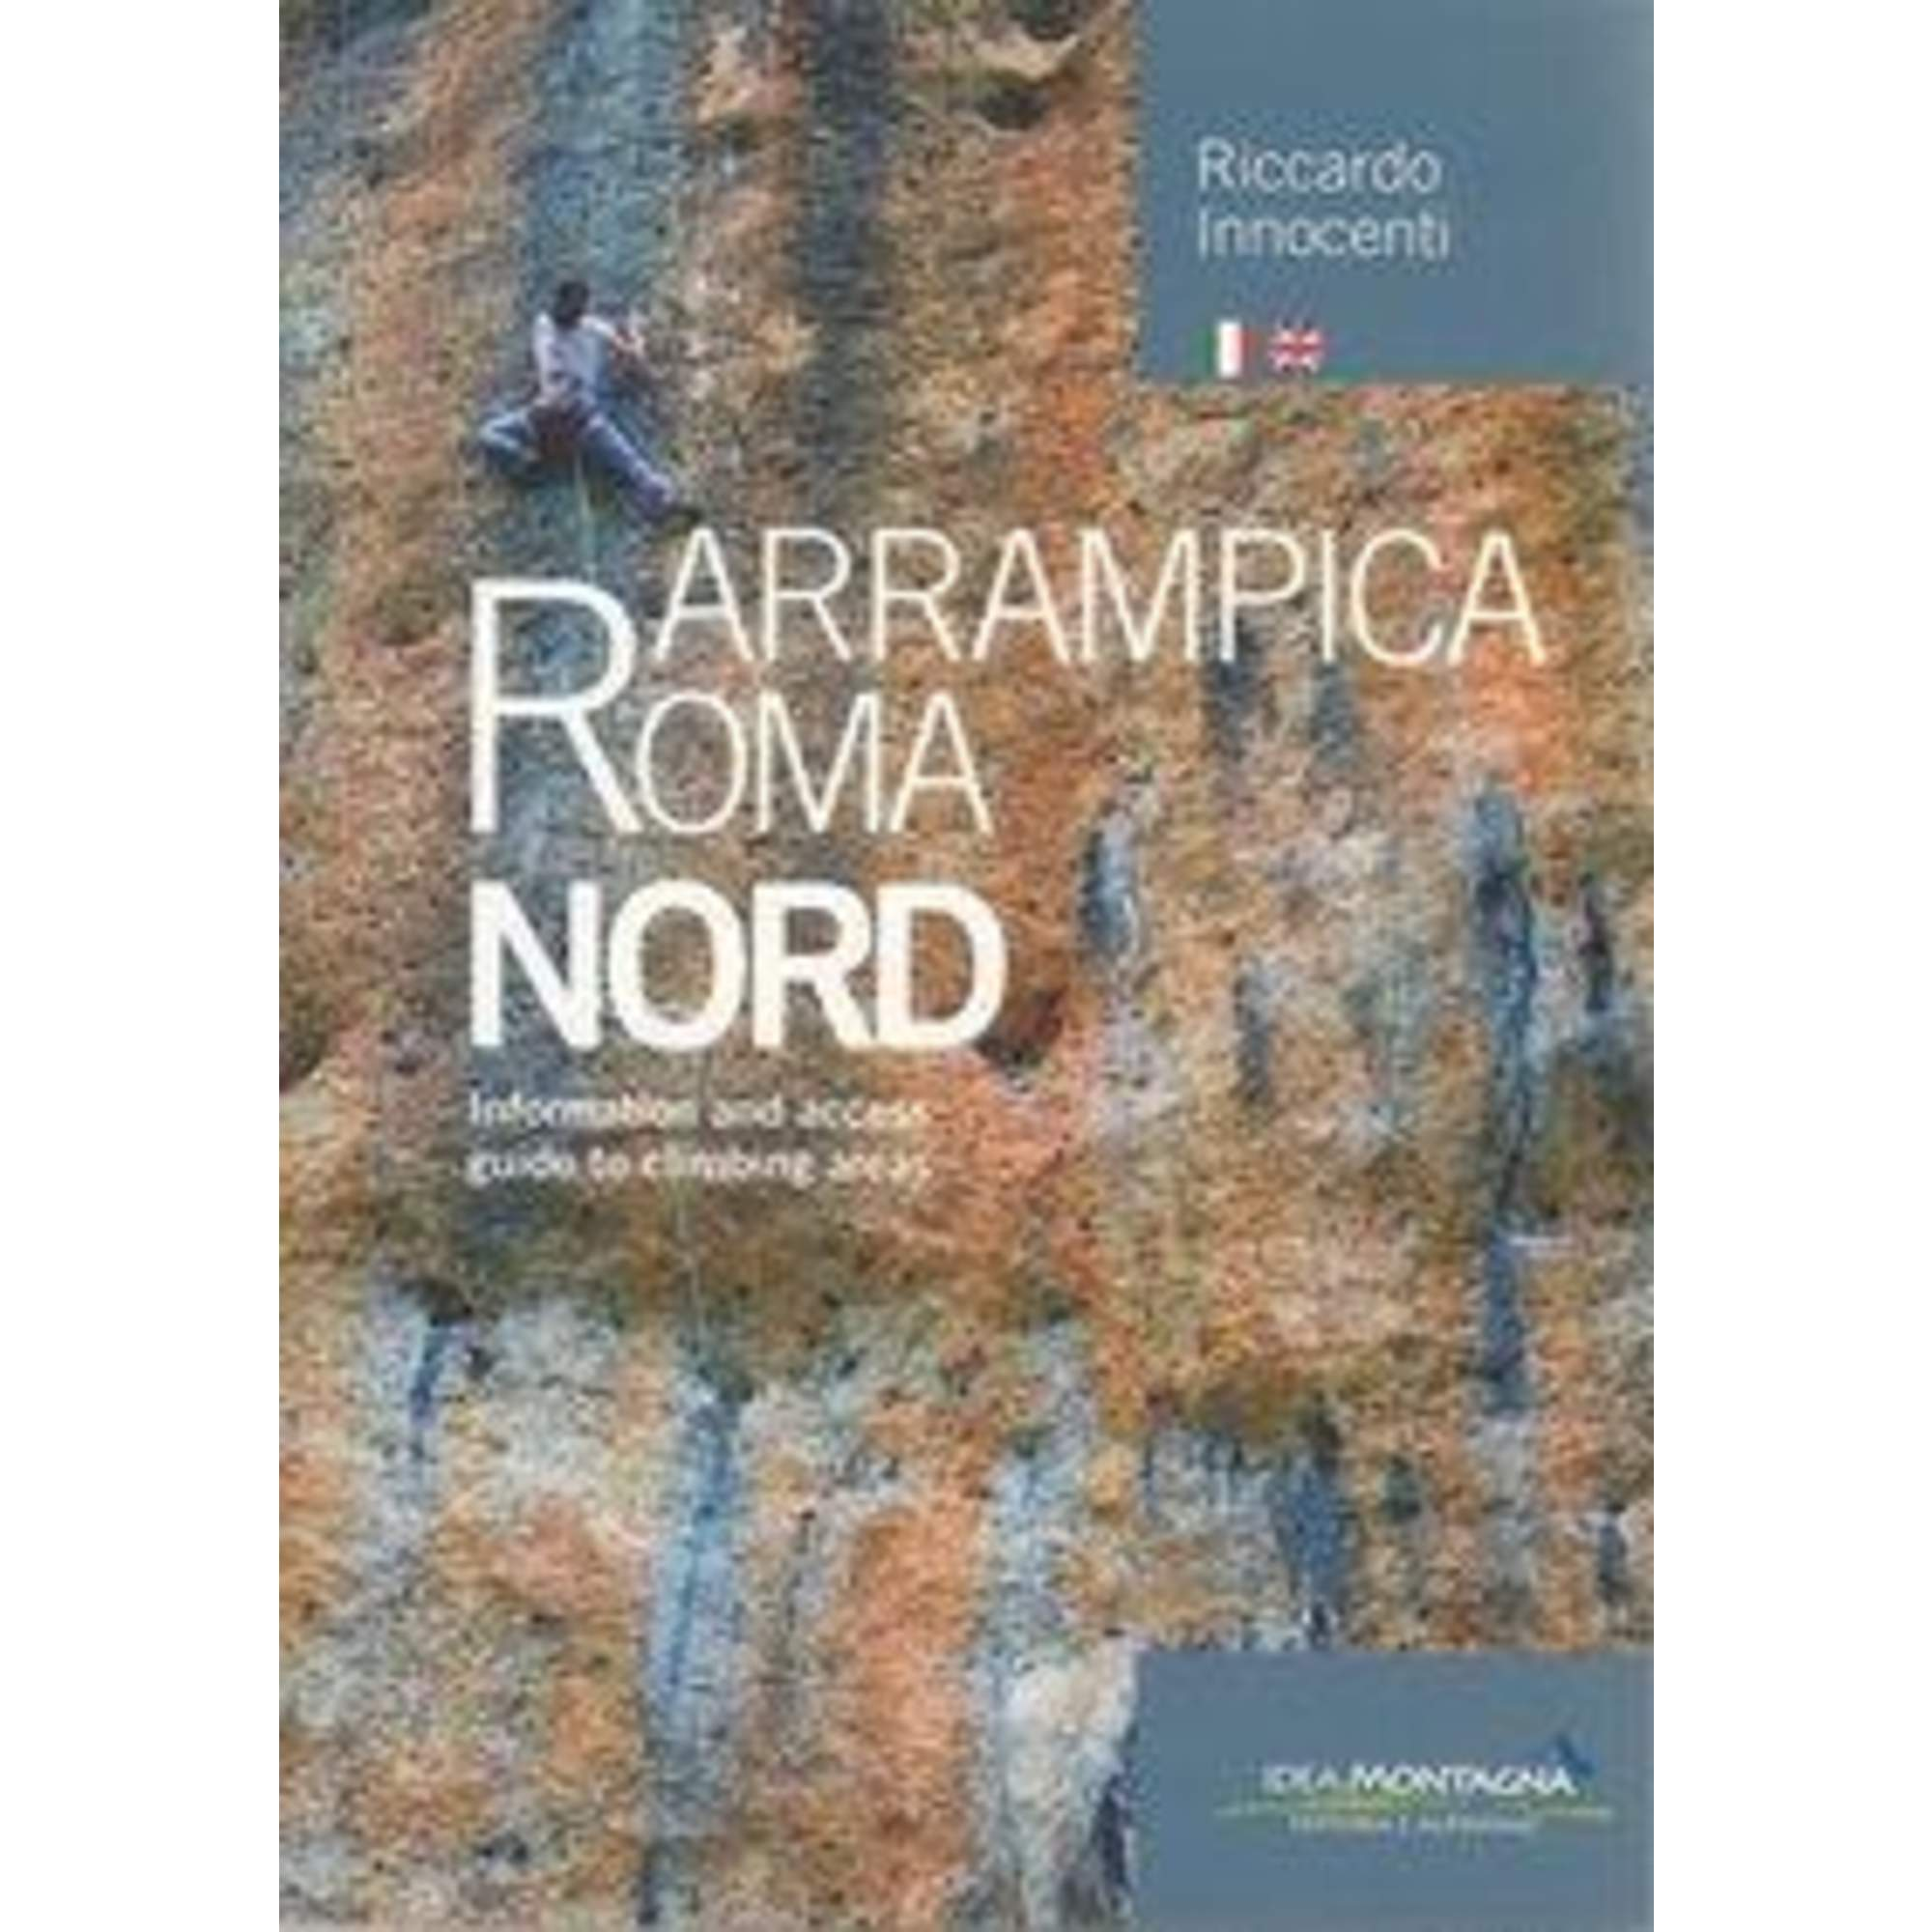 Arrampica Roma Nord, 35,00 Euro